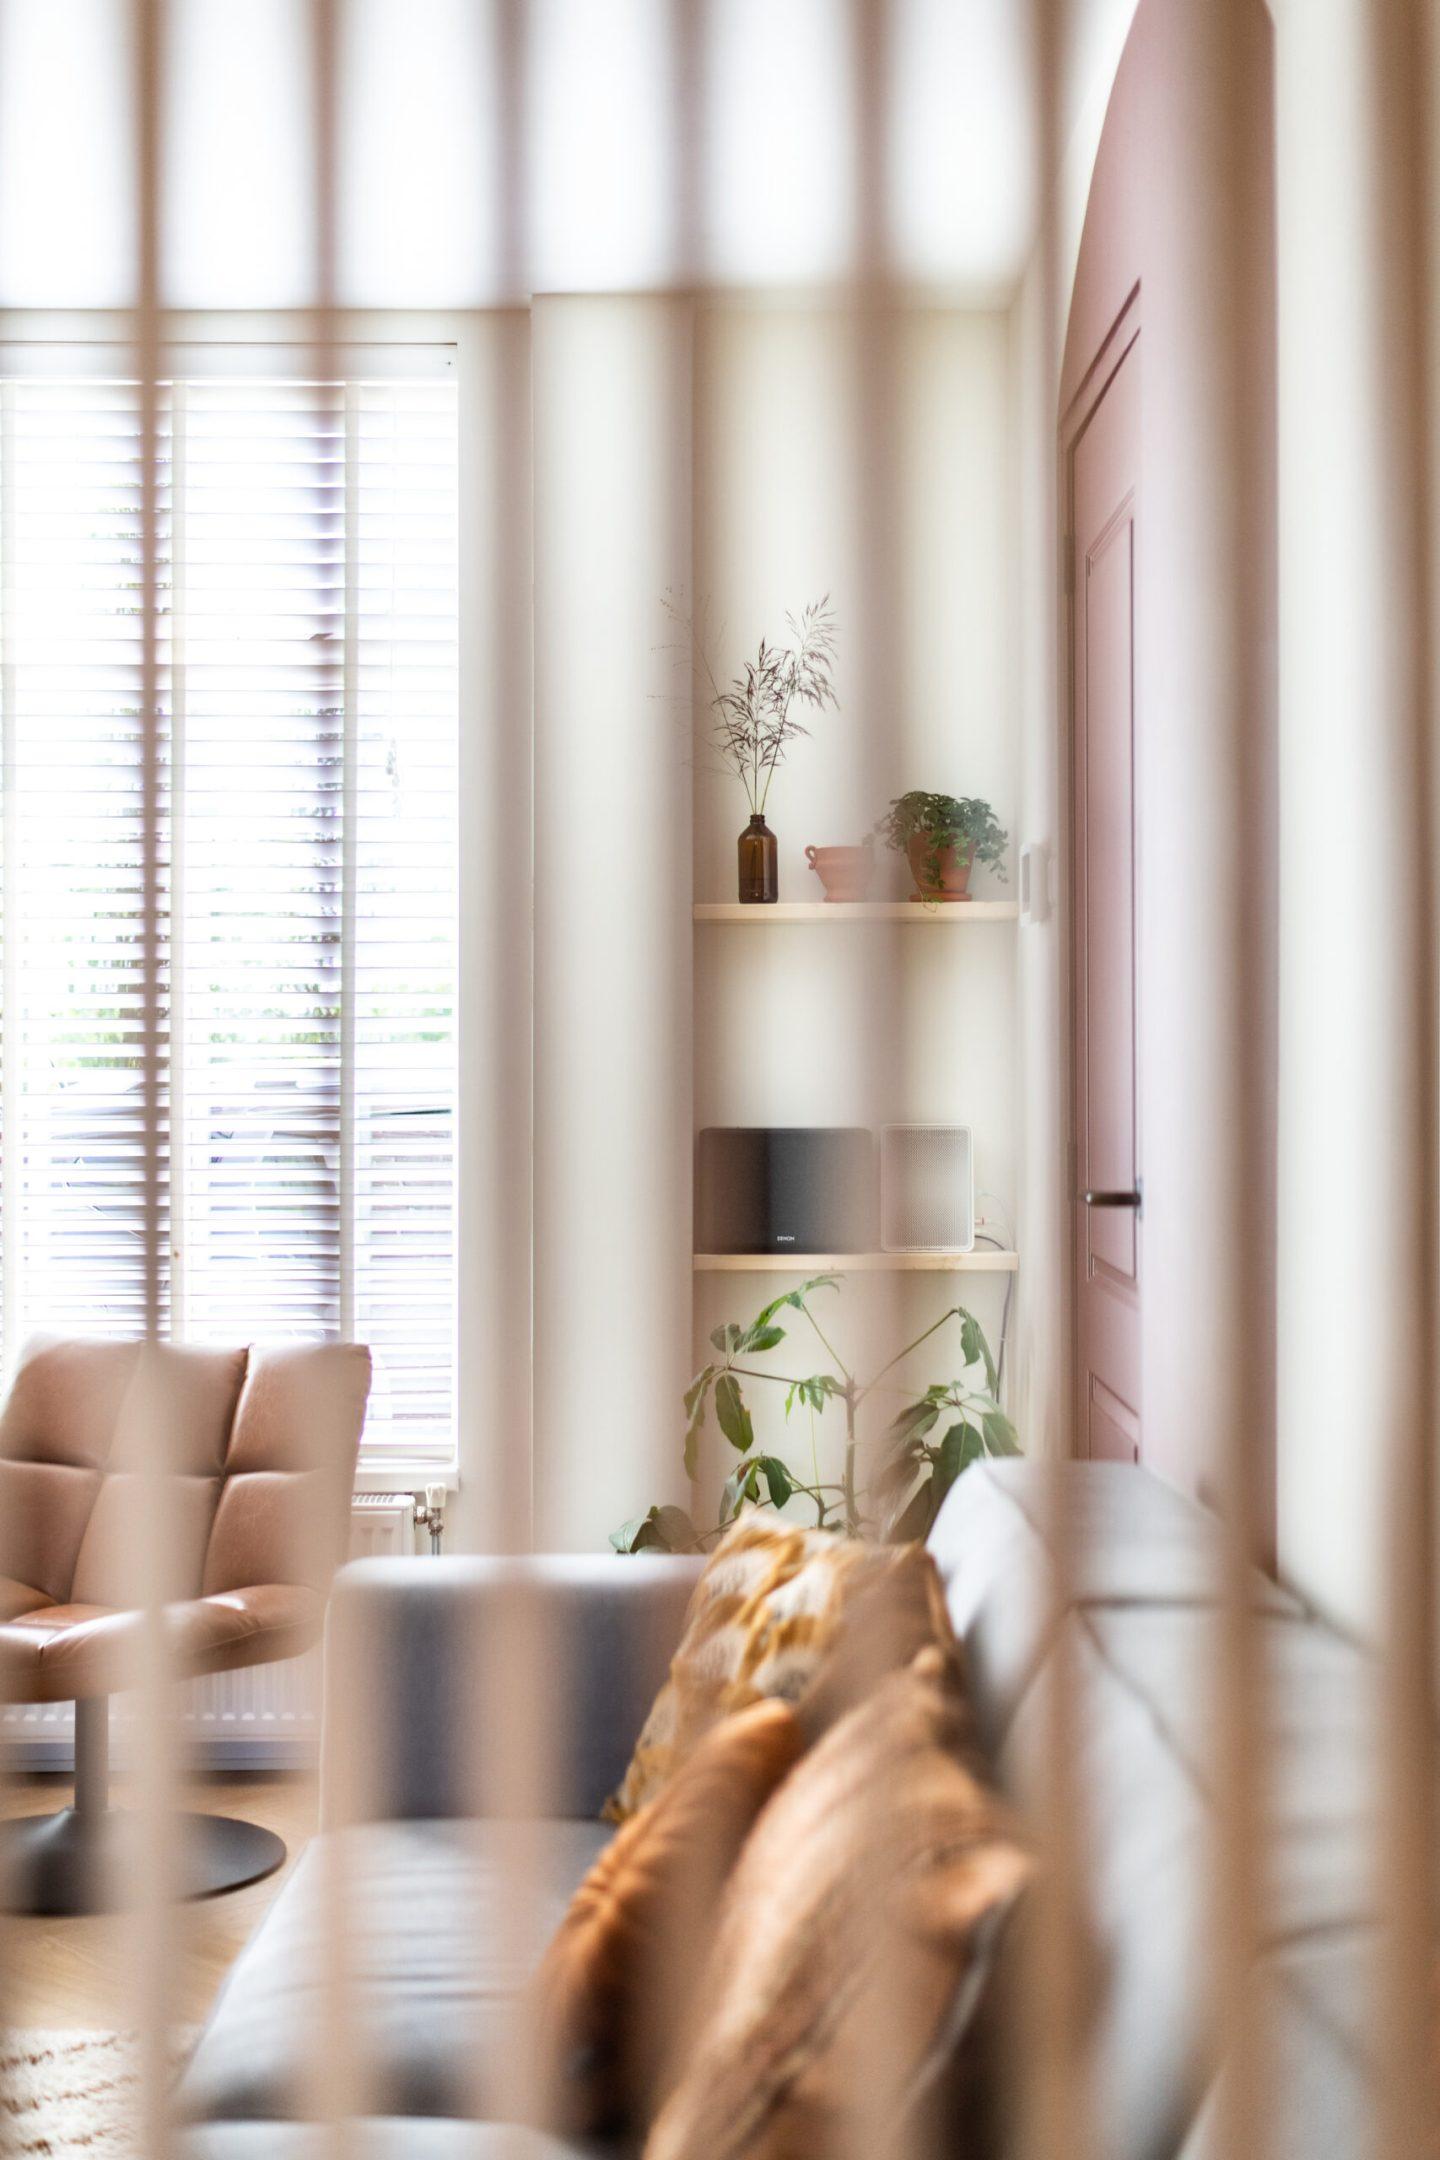 houten roomdivider keeelly91blog scheiding wand interieur inspiratie woonkamer